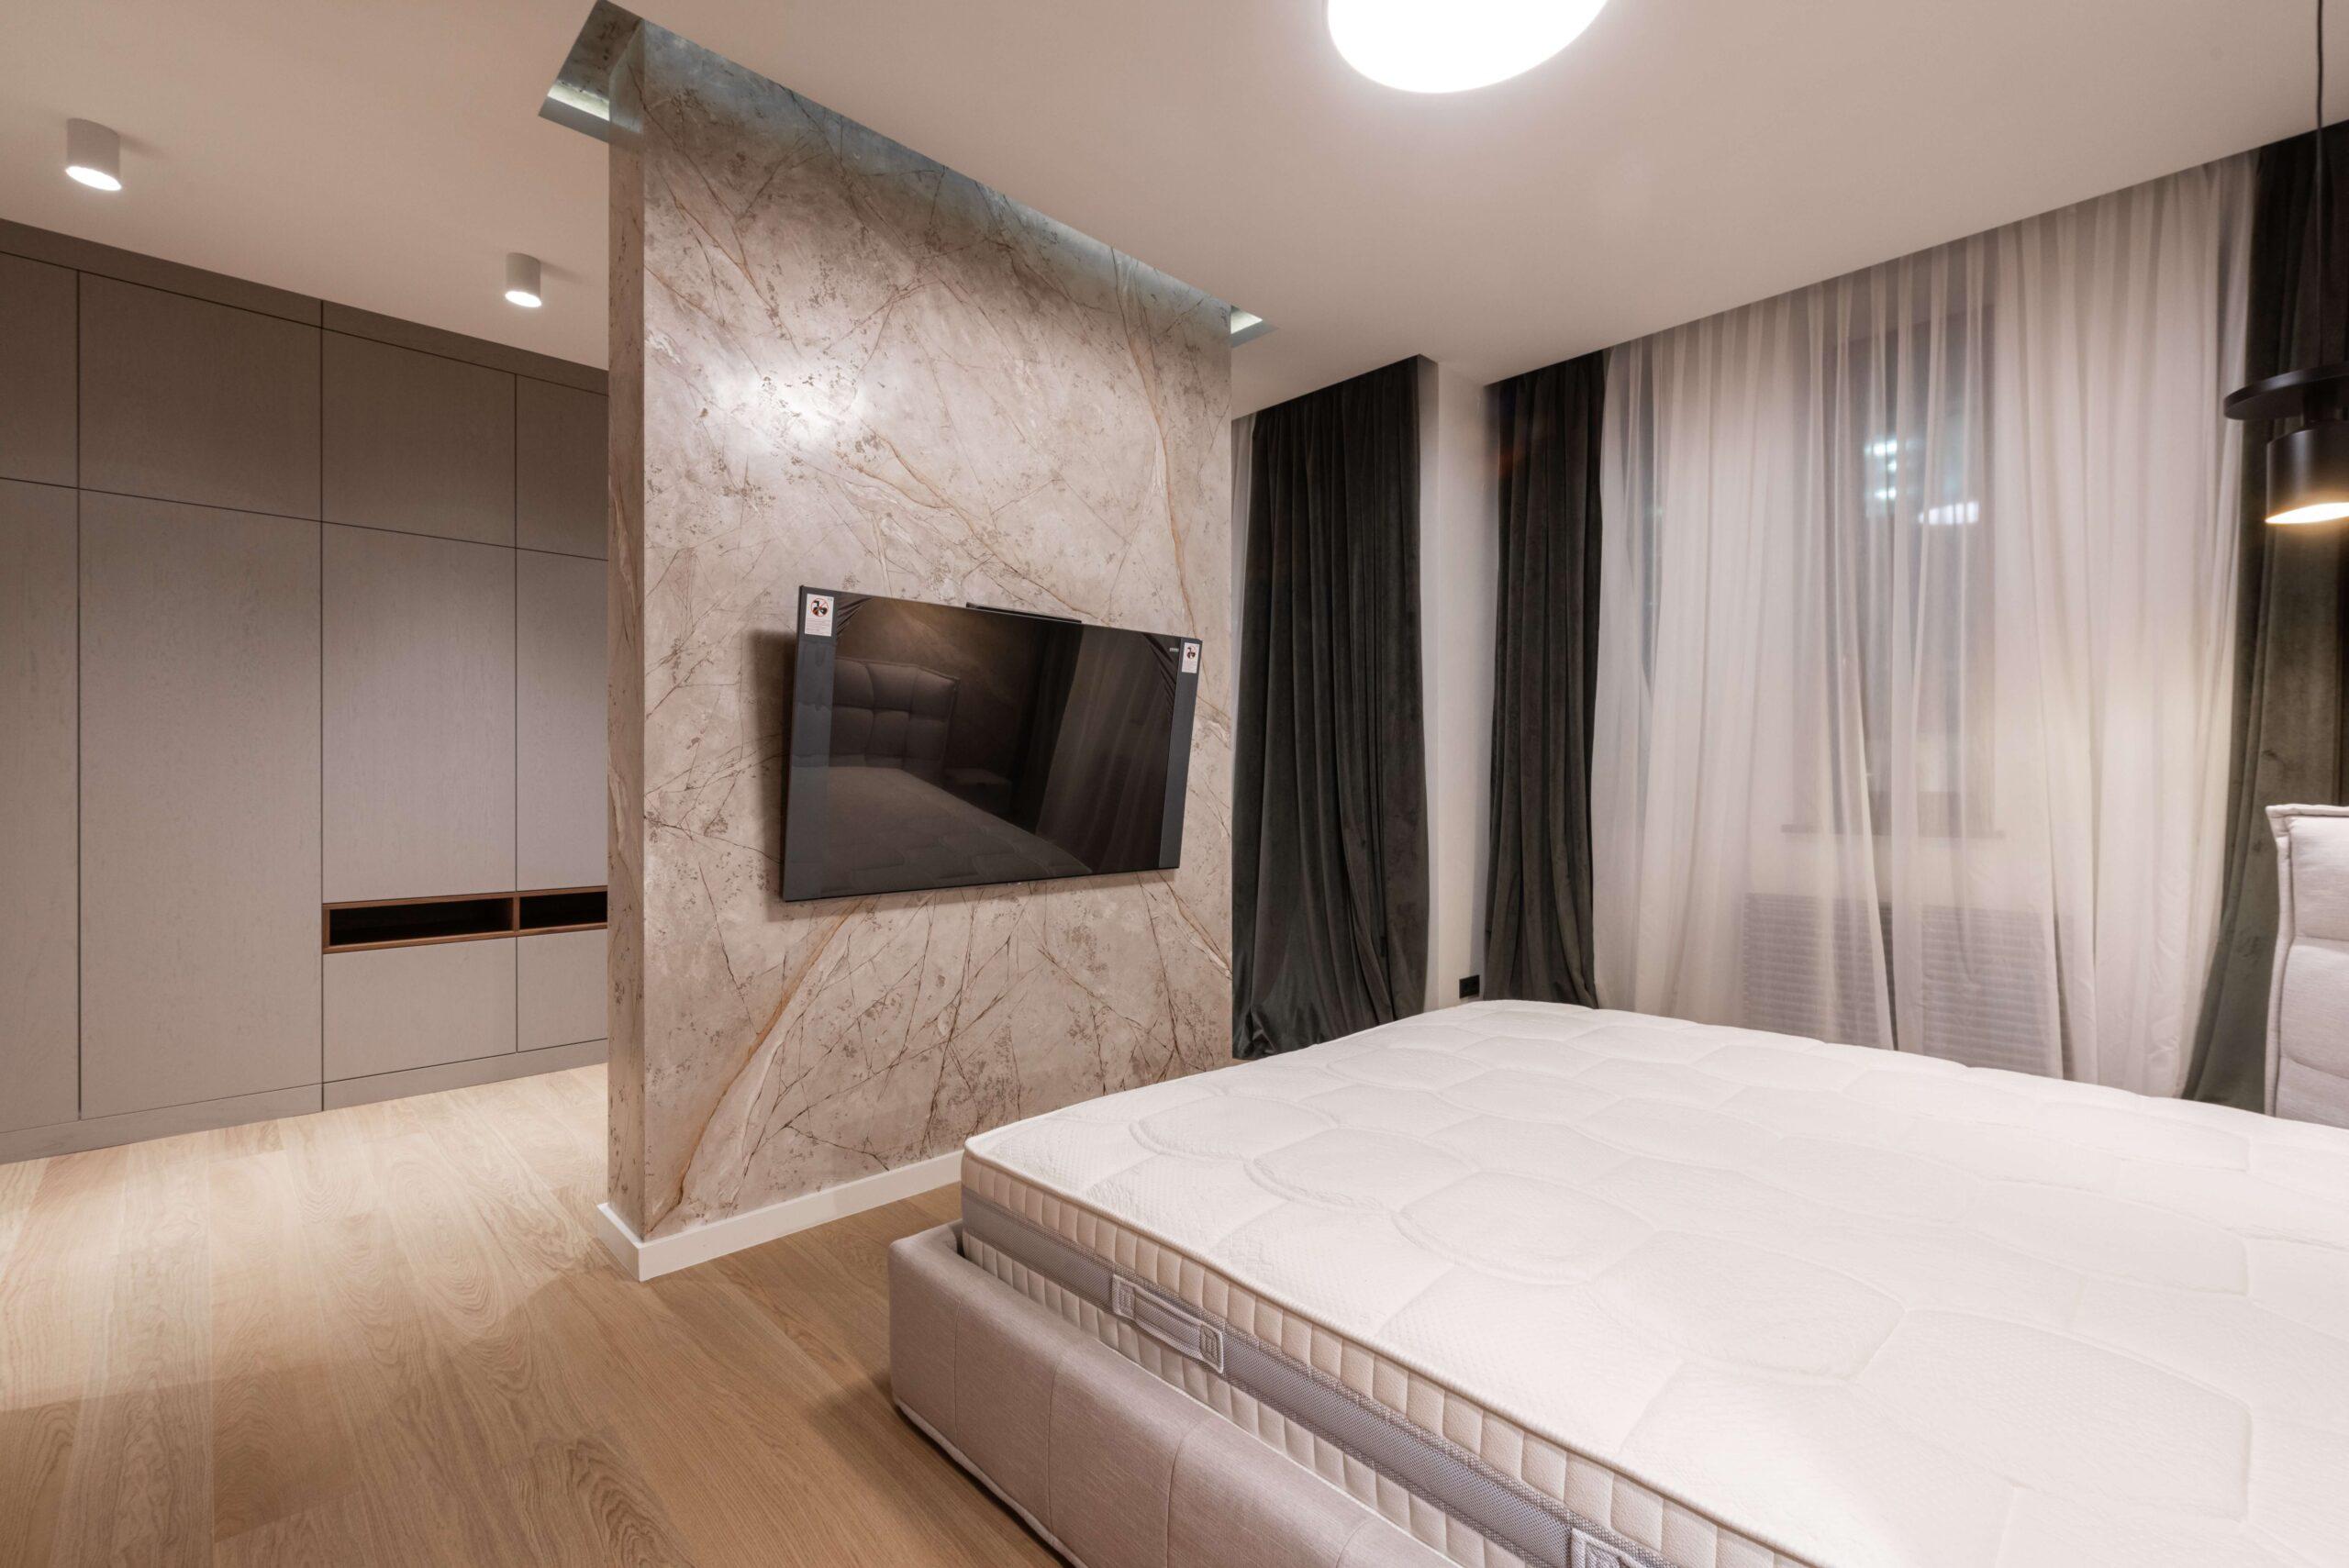 6 Best Bedroom TV Mounting Ideas